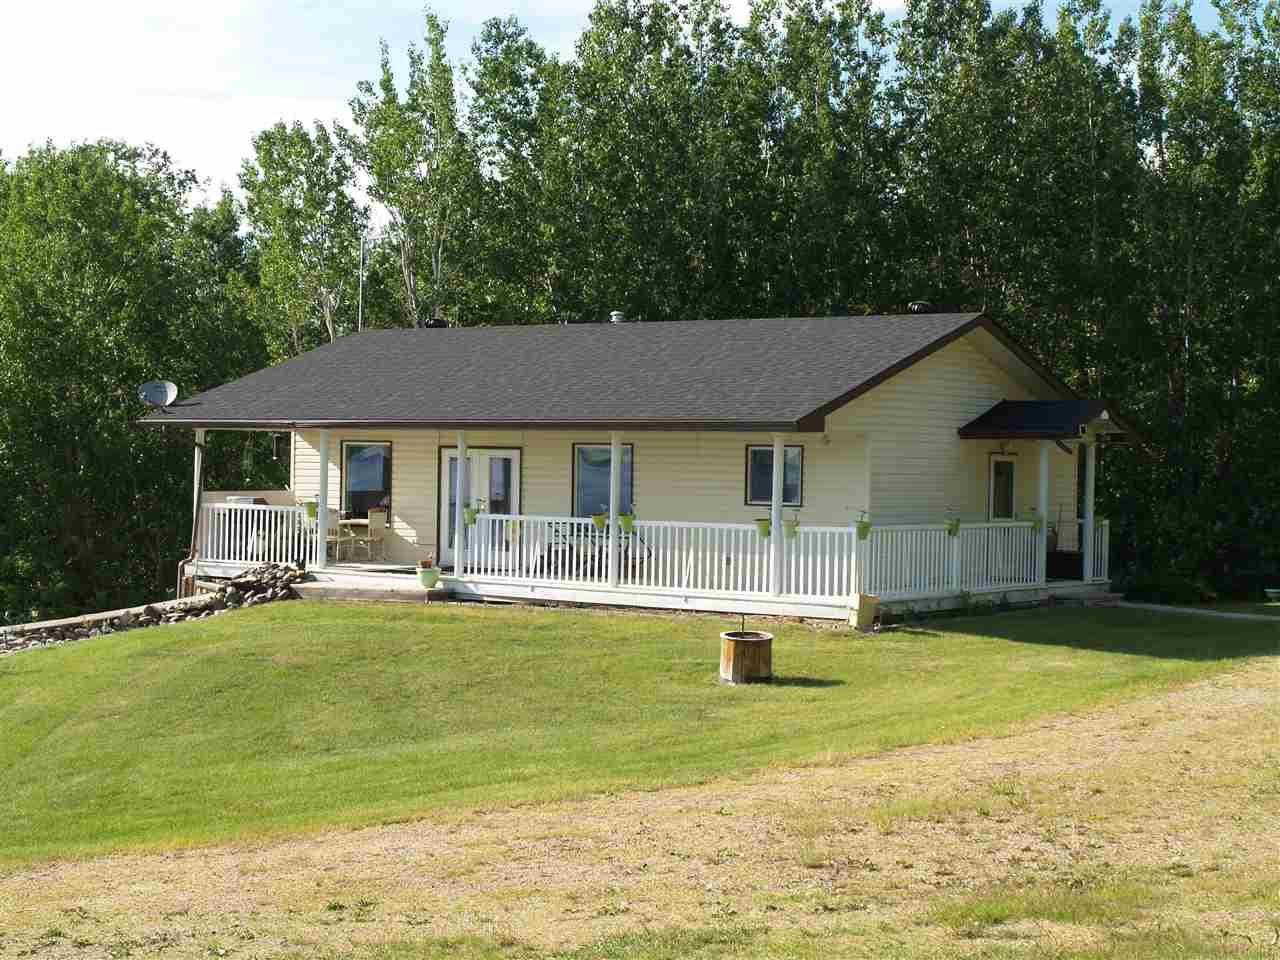 Main Photo: 60312 RR 164: Rural Smoky Lake County House for sale : MLS®# E4150497